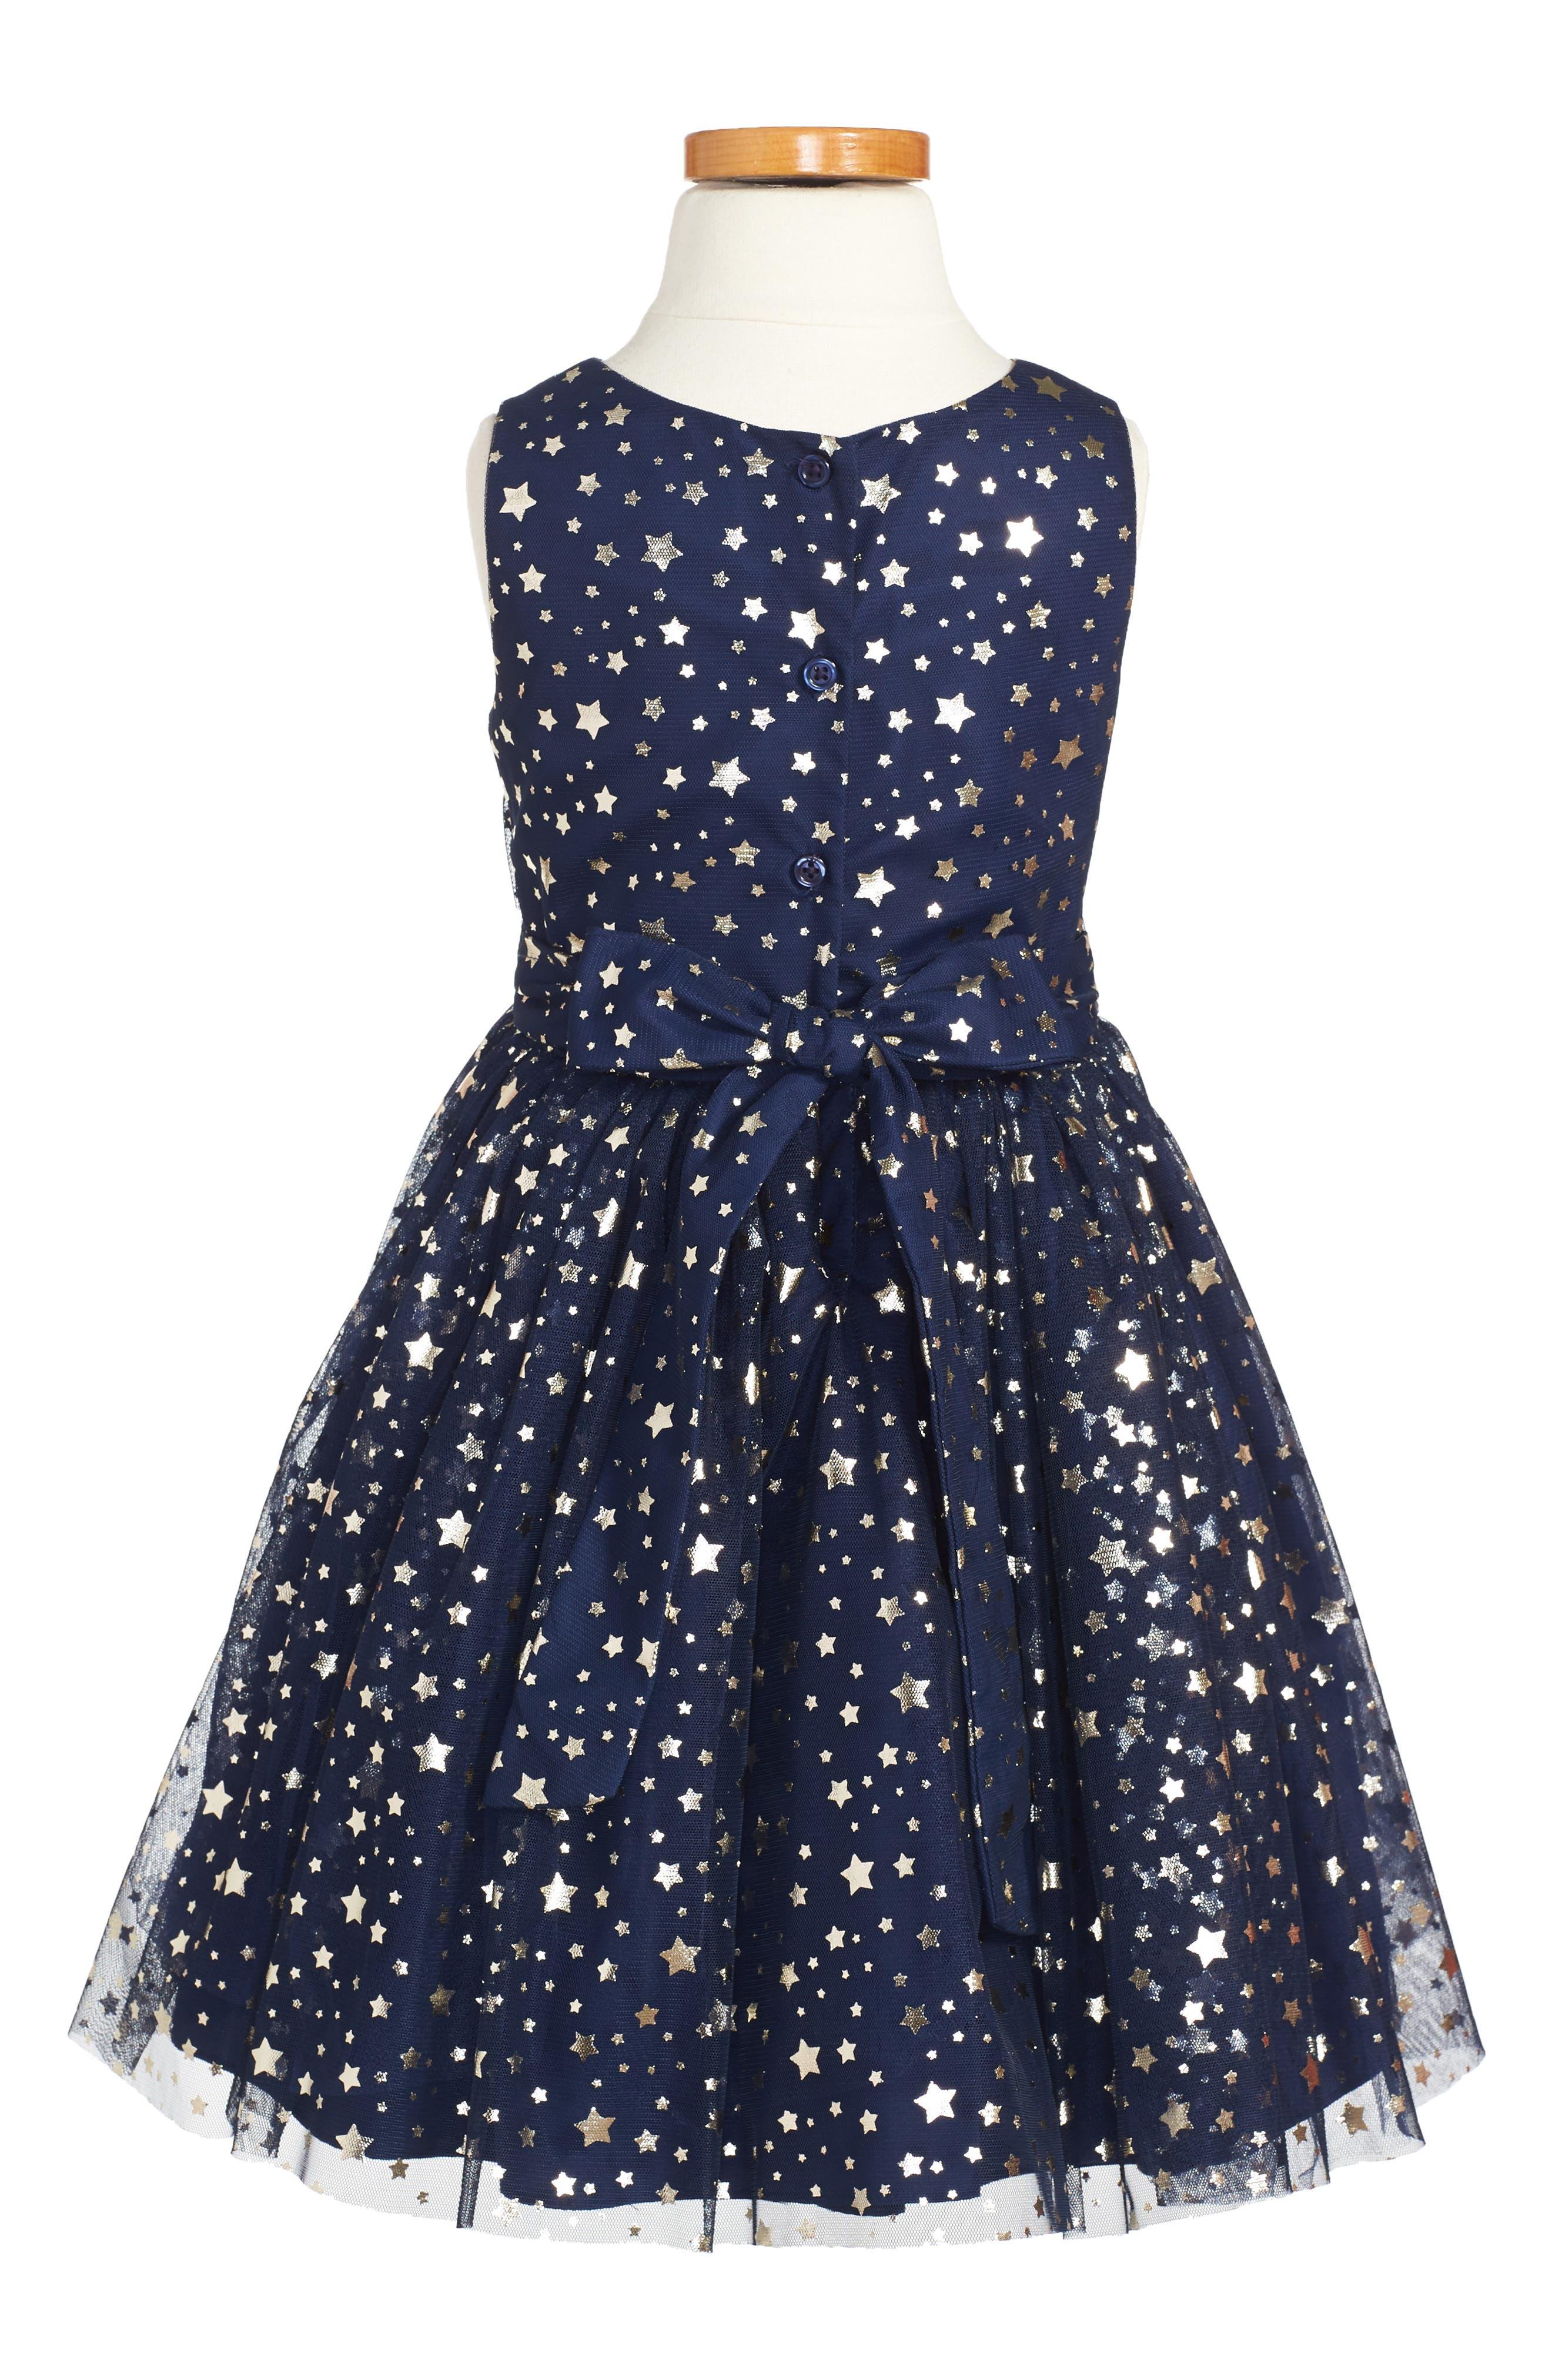 Metallic Stars Party Dress,                             Main thumbnail 1, color,                             450